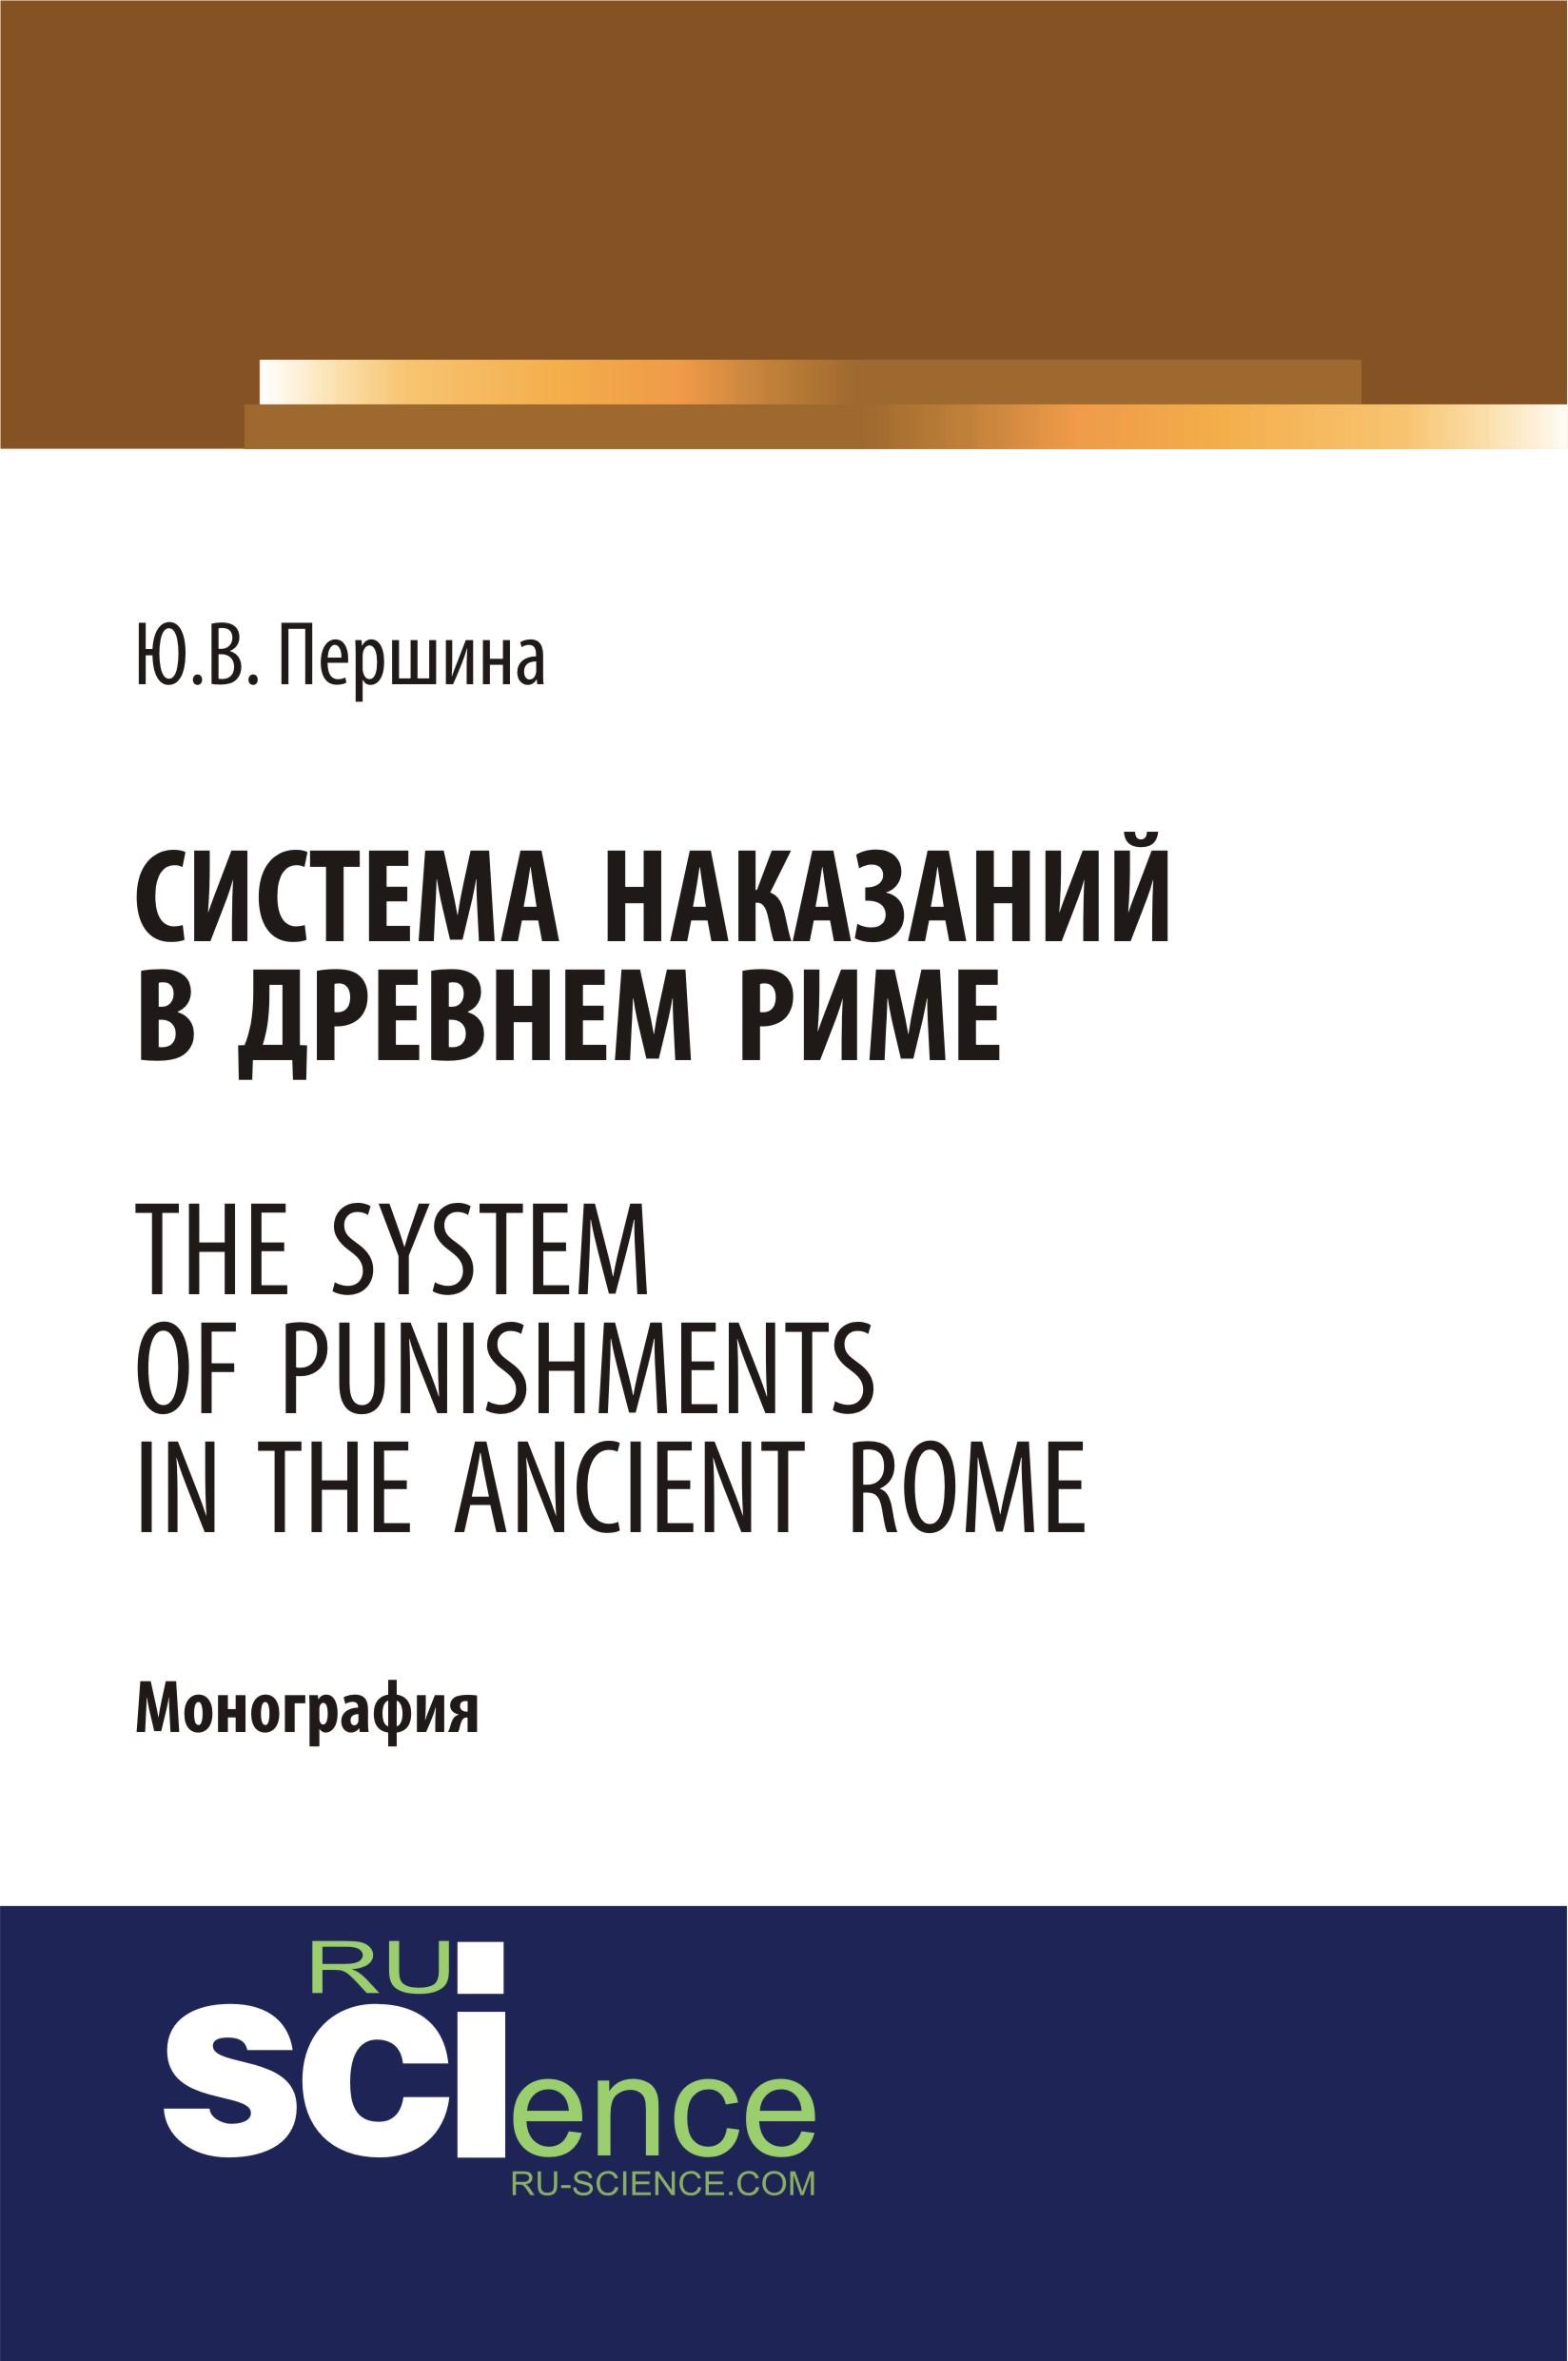 Система наказаний в Древнем Риме. The system of punishments in the Ancient Rome